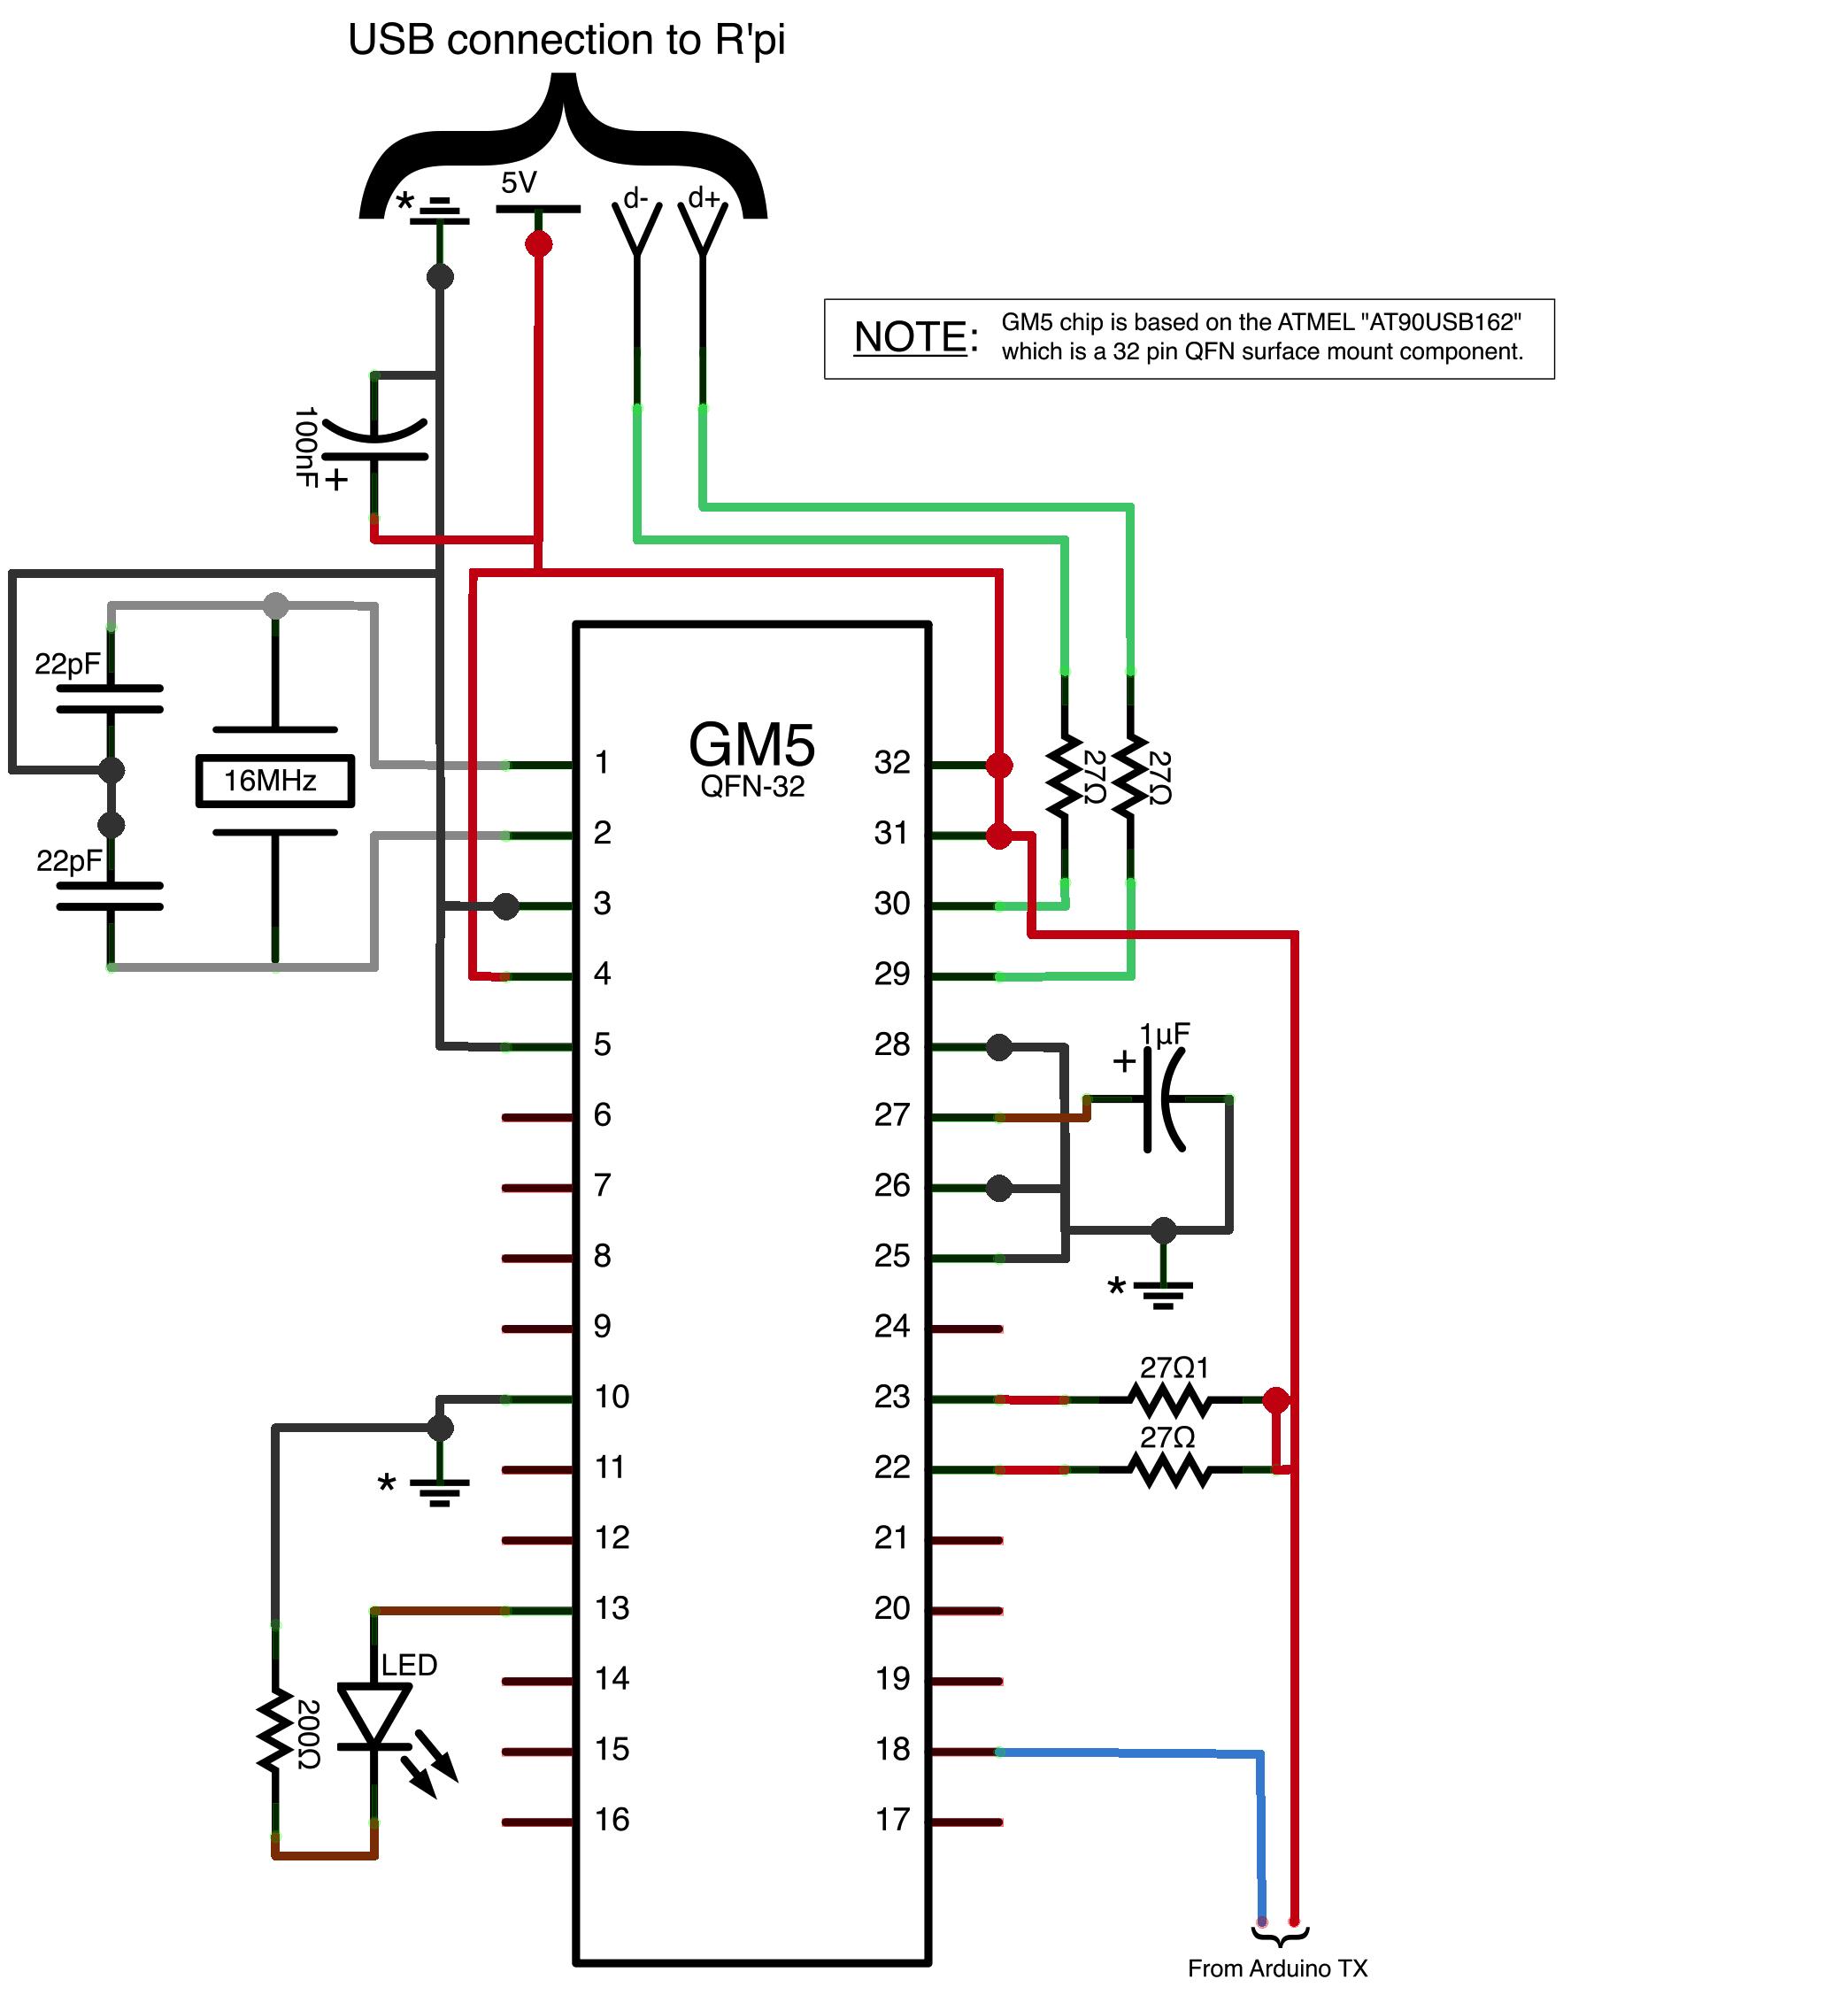 LZ_2323] Midi To Usb Wiring Diagram Schematic WiringIcand Ixtu Phae Mohammedshrine Librar Wiring 101